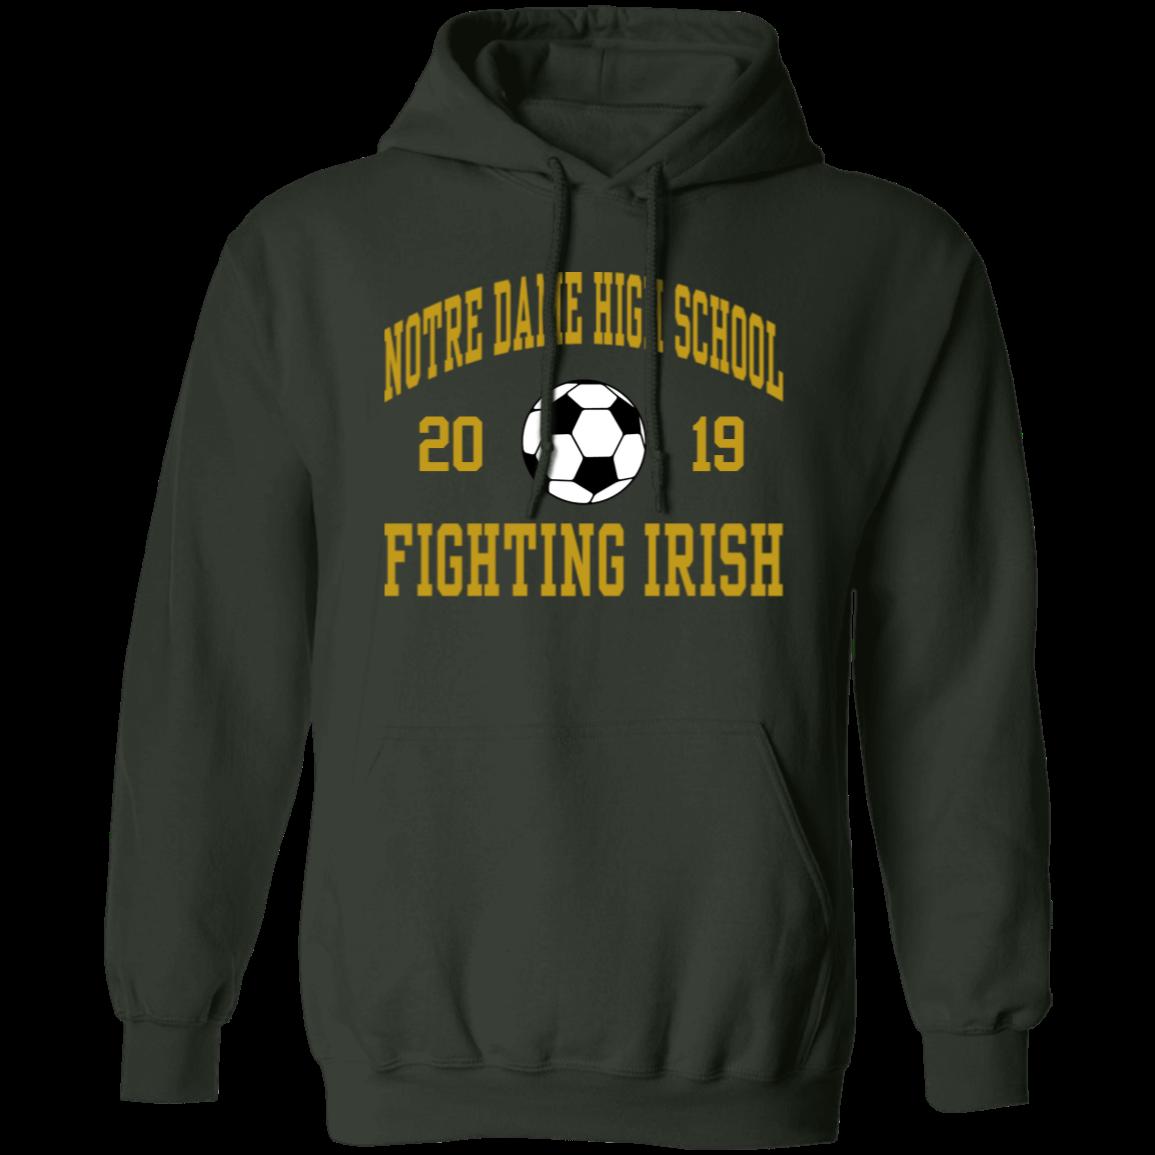 54d5ad1a Notre Dame High School Pullover Hoodie 8 oz - SpiritShop.com